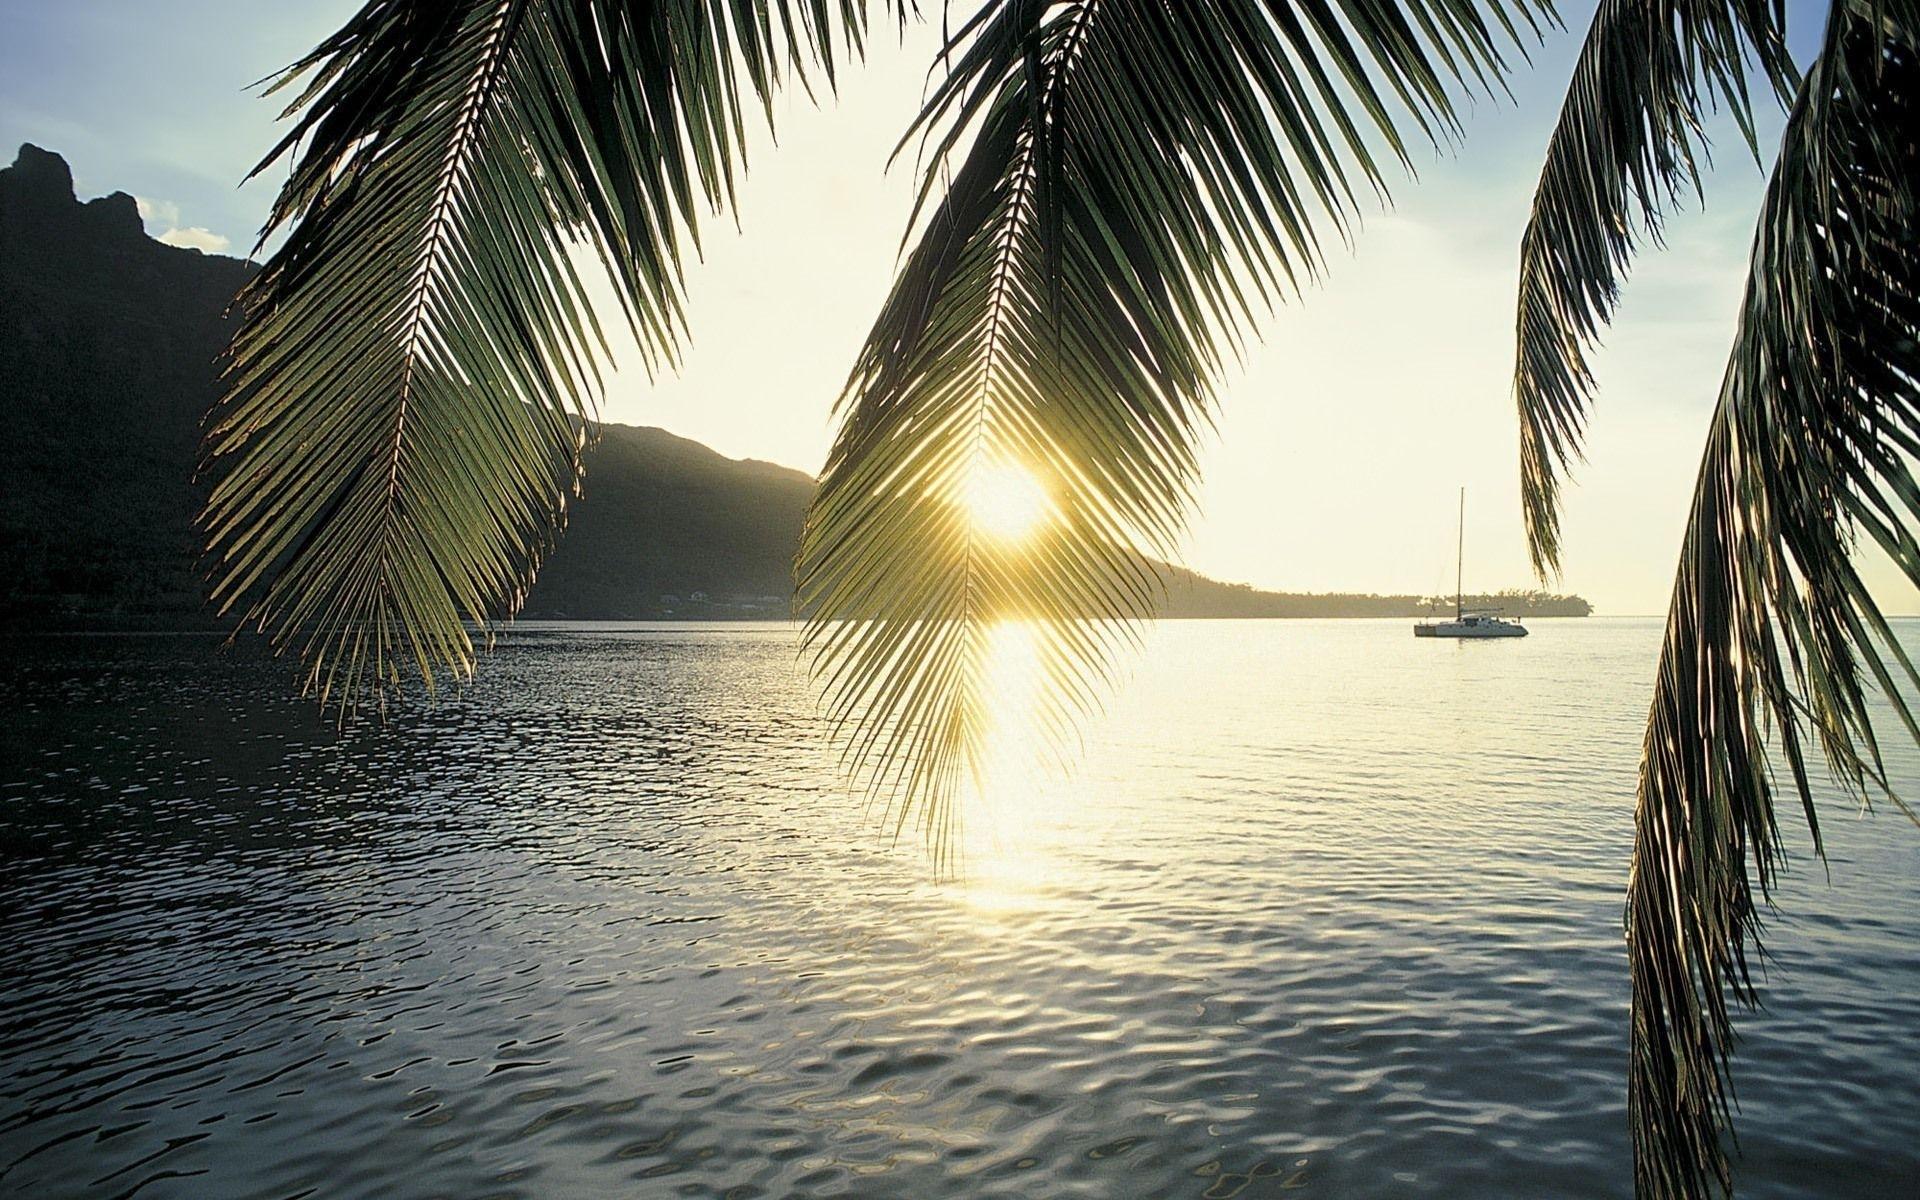 10 Latest Palm Tree Desktop Backgrounds FULL HD 1080p For PC Desktop